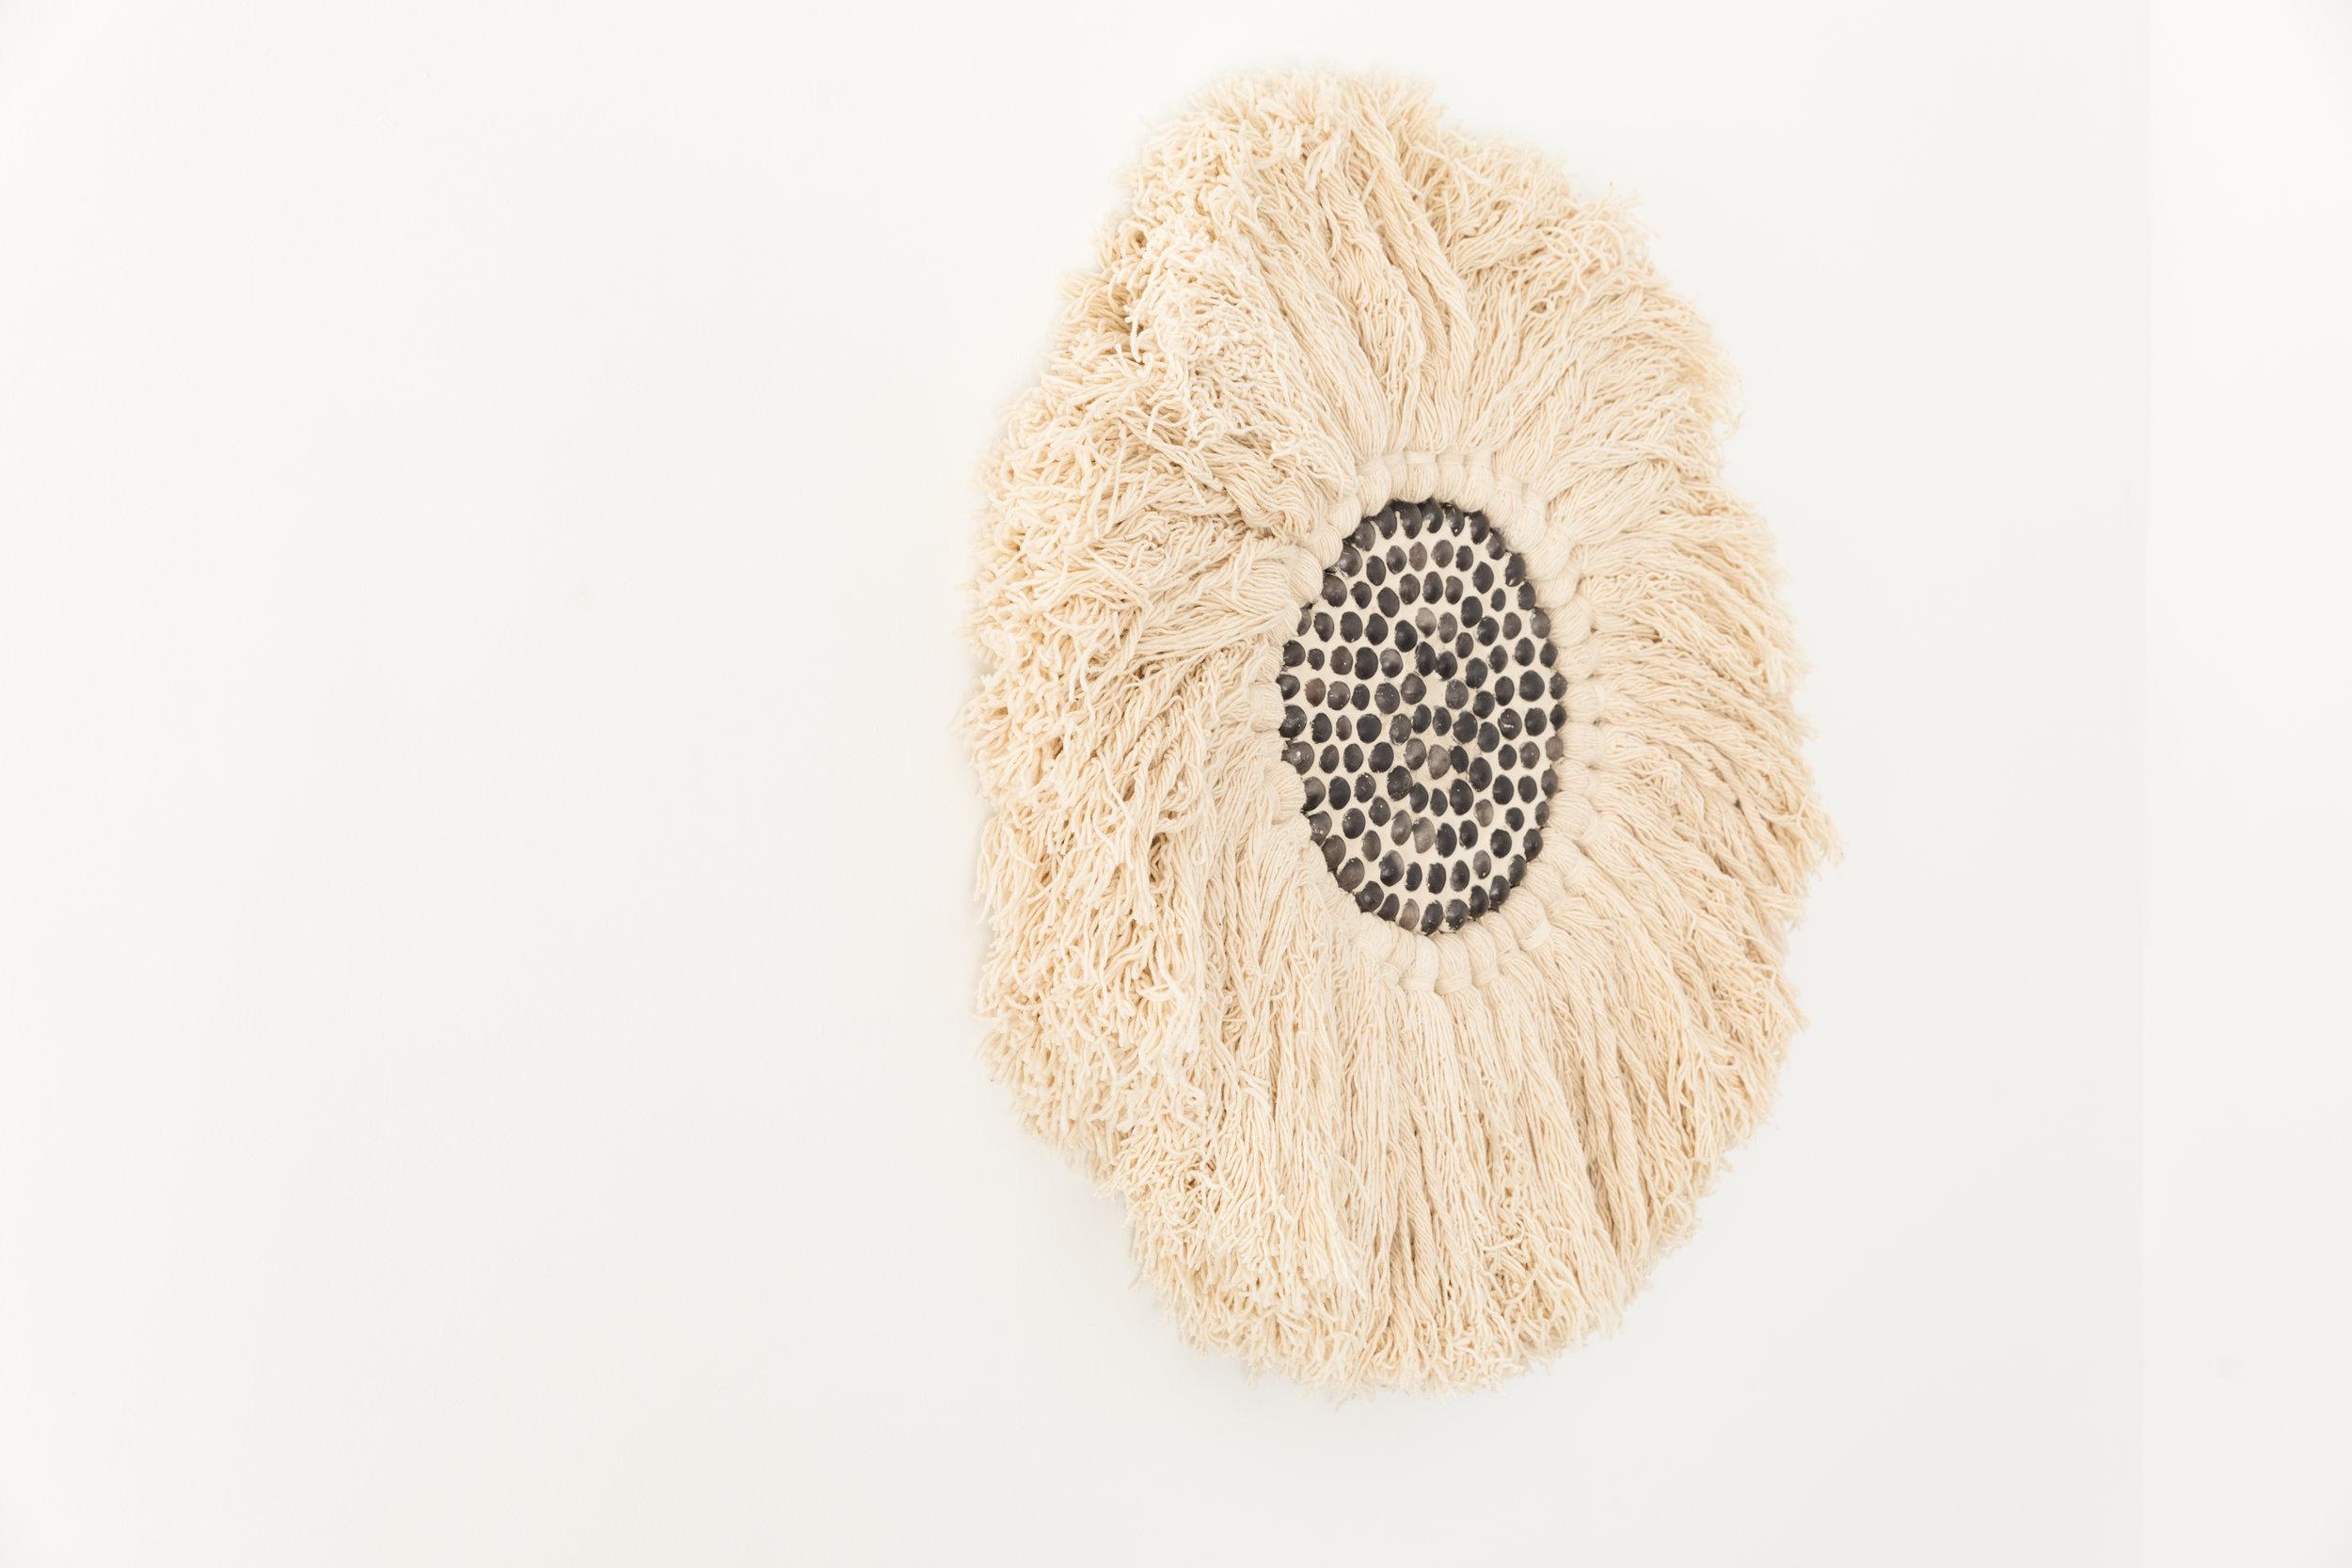 Magic Eye  , 2018, Oaxacan black clay, sand, merino on wood panel, 36 inches diameter